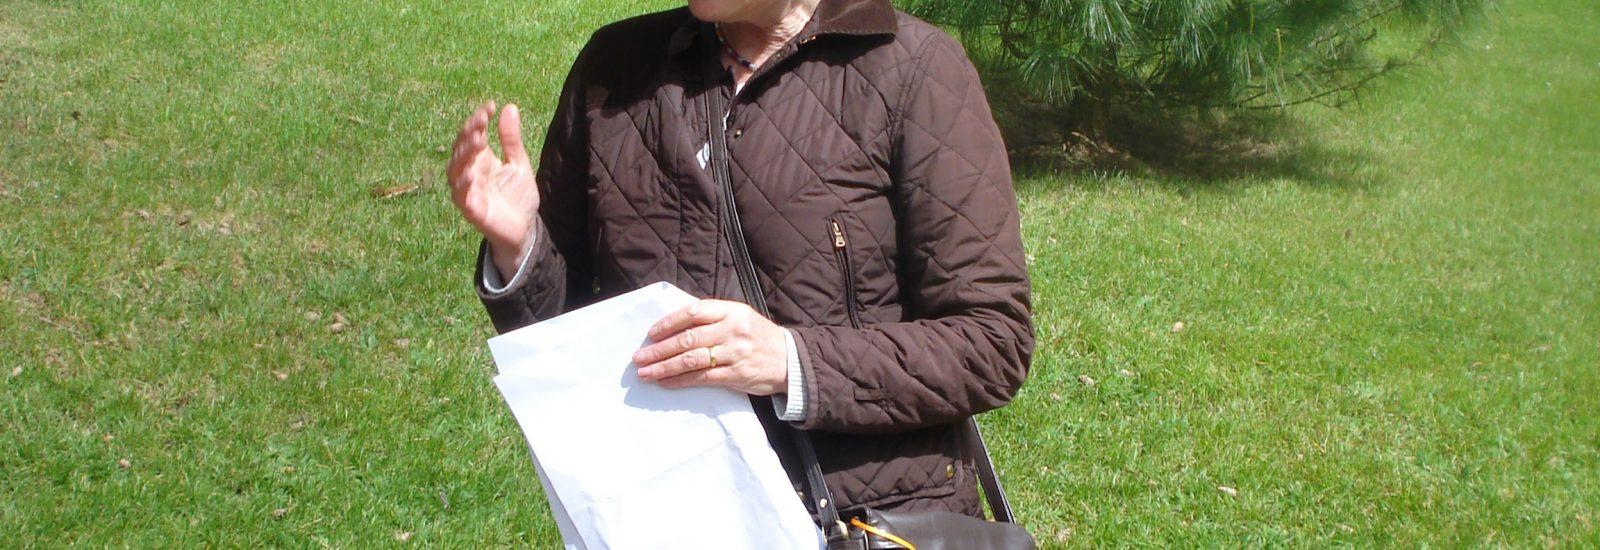 Guided walking tour of Powerscourt Gardens with Sara Waldburg